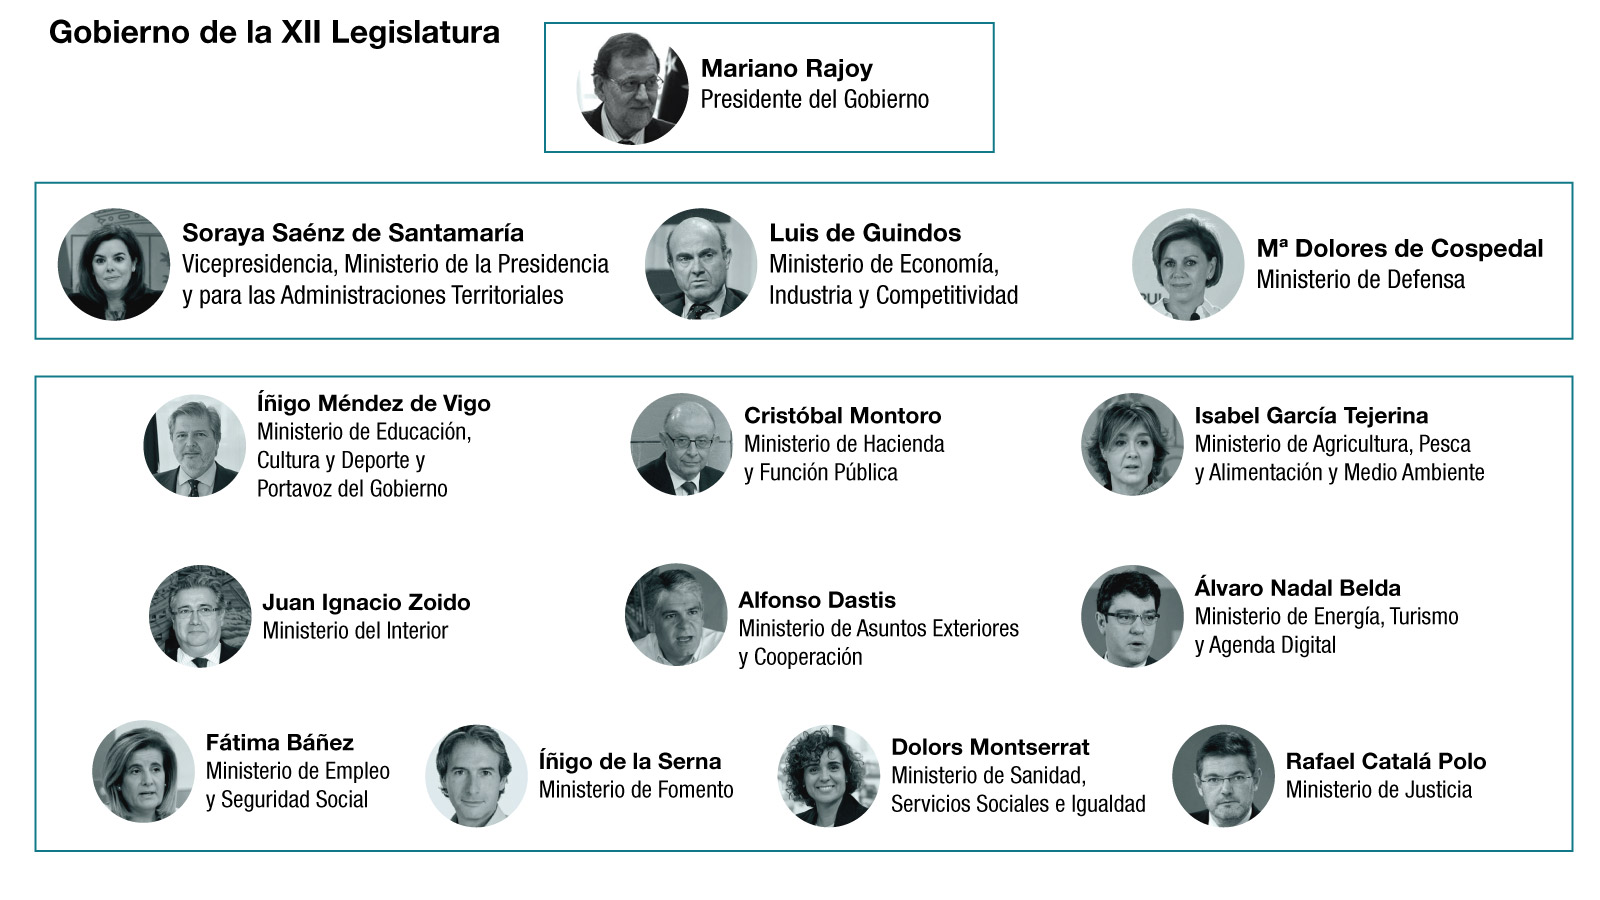 Gobierno de la XII Legislatura